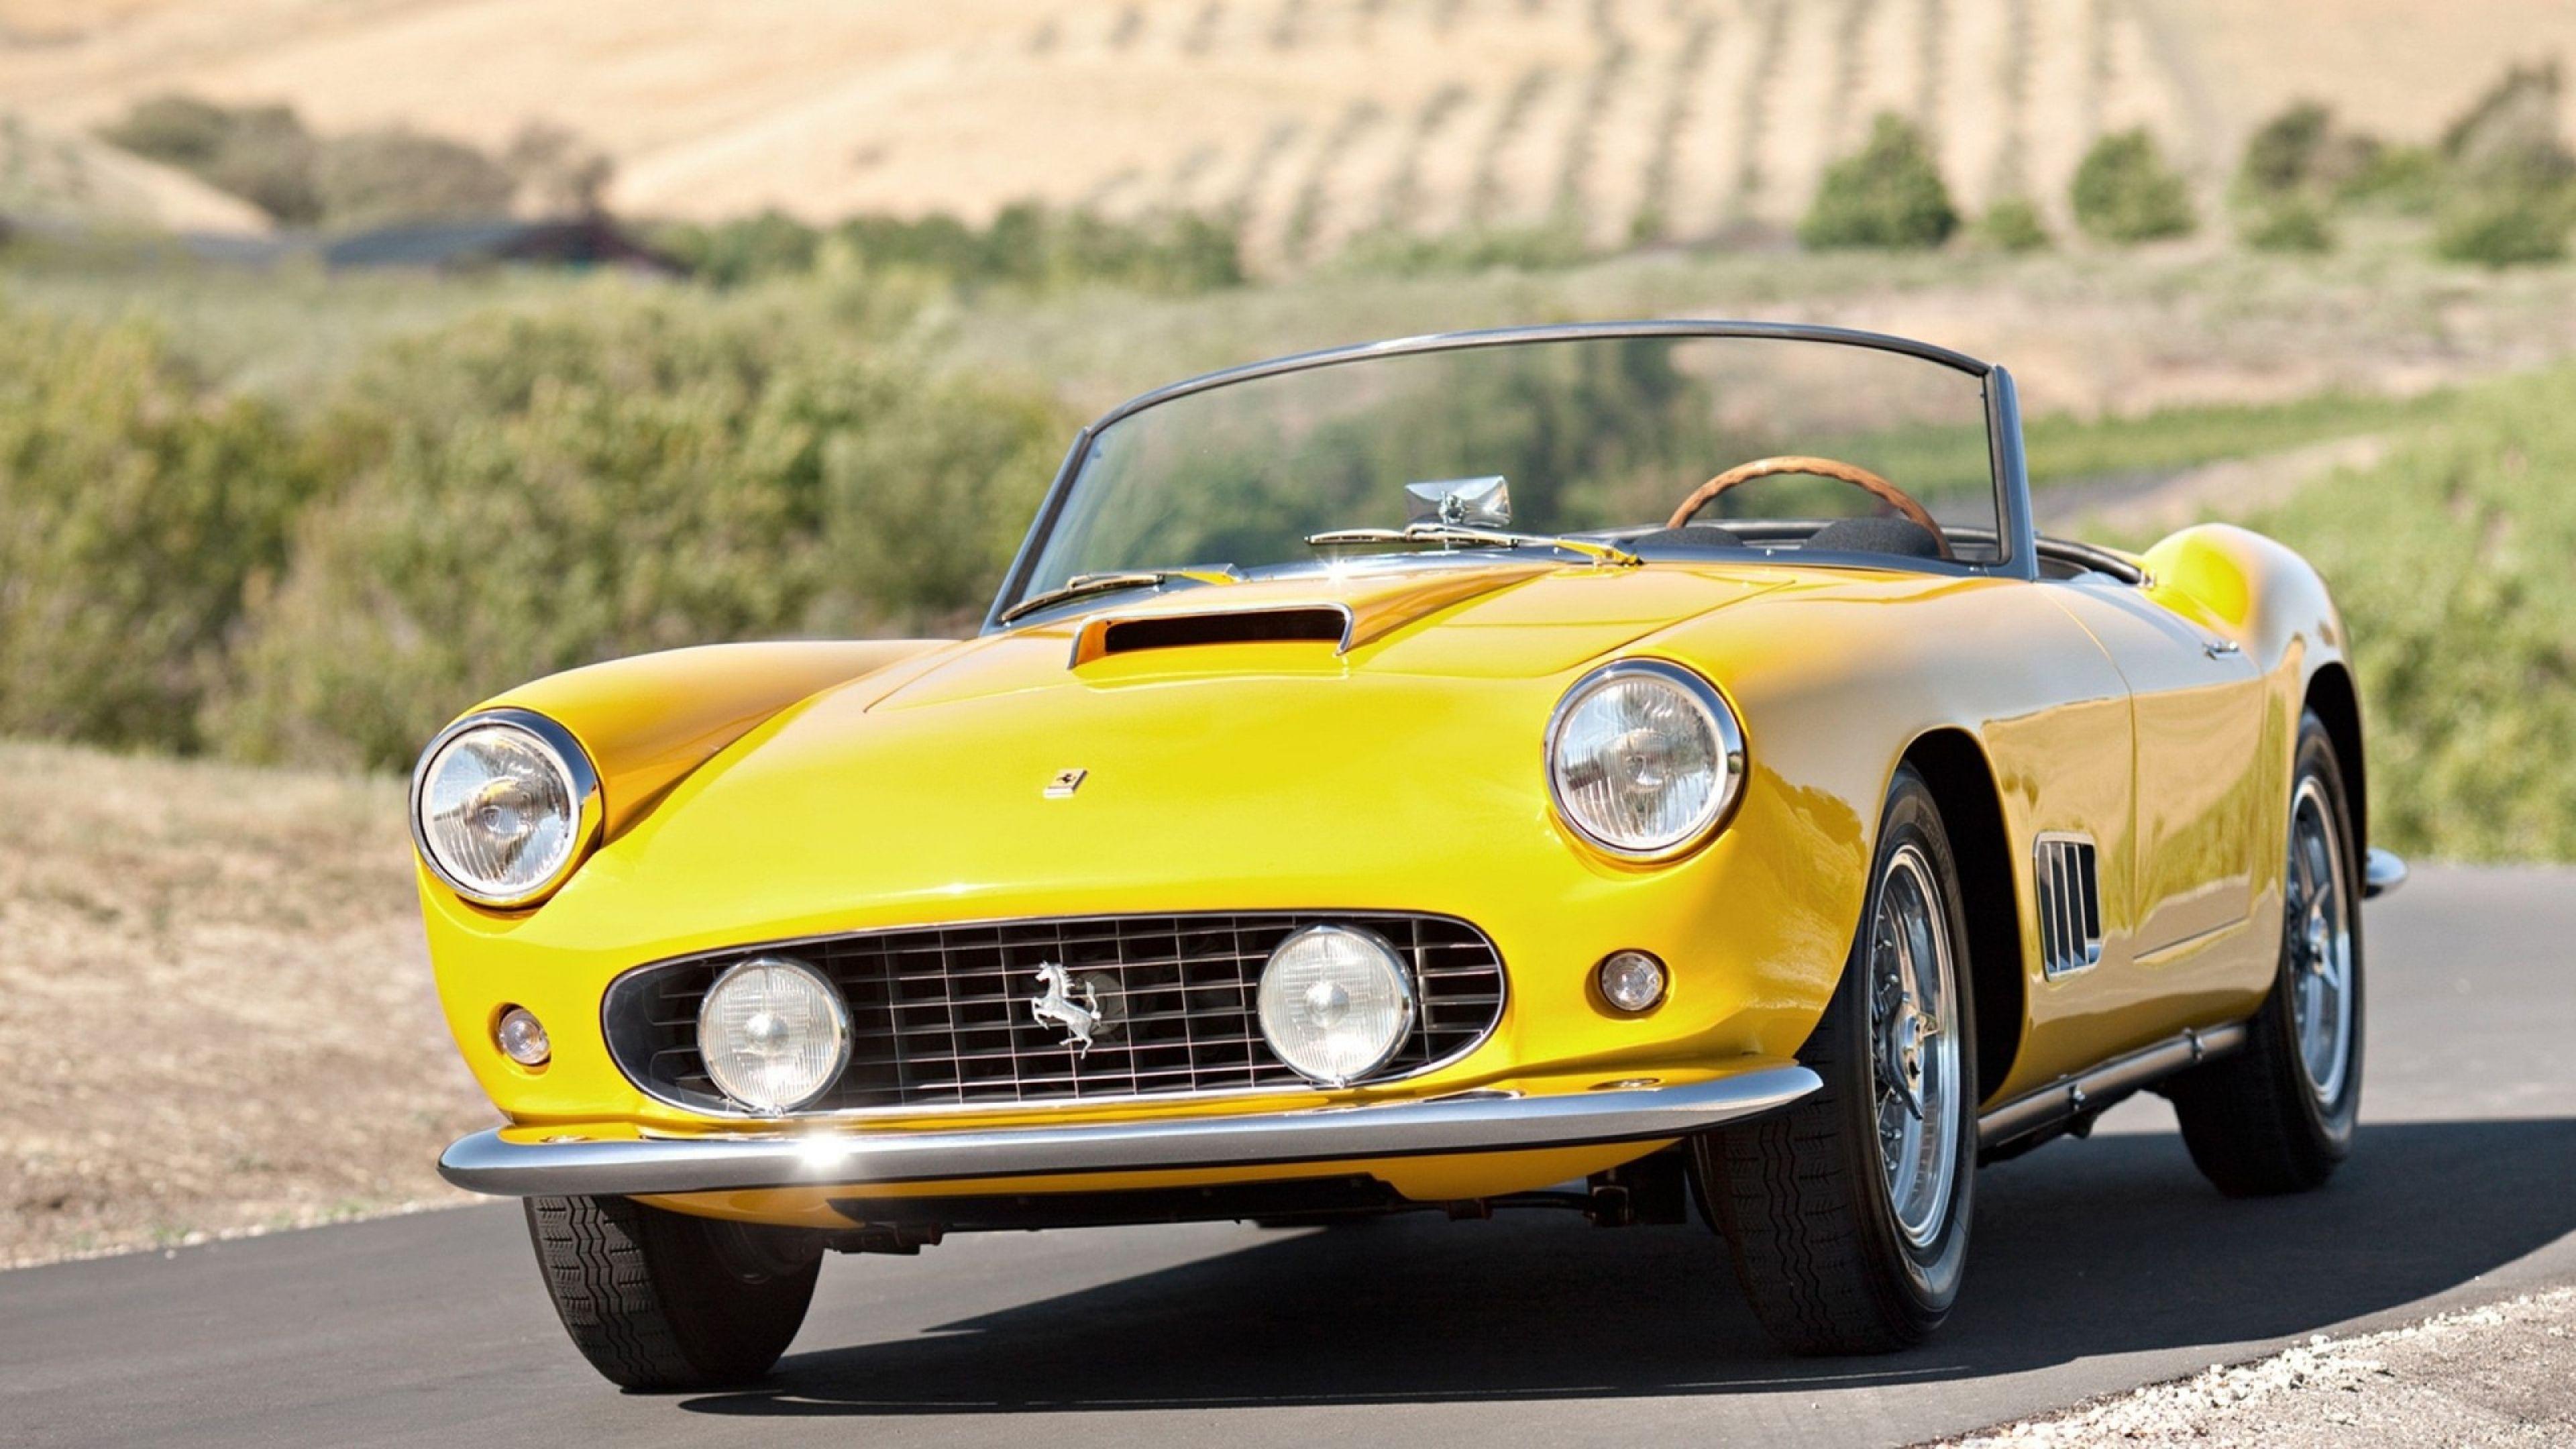 4k Ultra Hd Vintage Wallpapers Hd Desktop Backgrounds 3840x2160 Ferrari Vintage Ferrari Super Cars